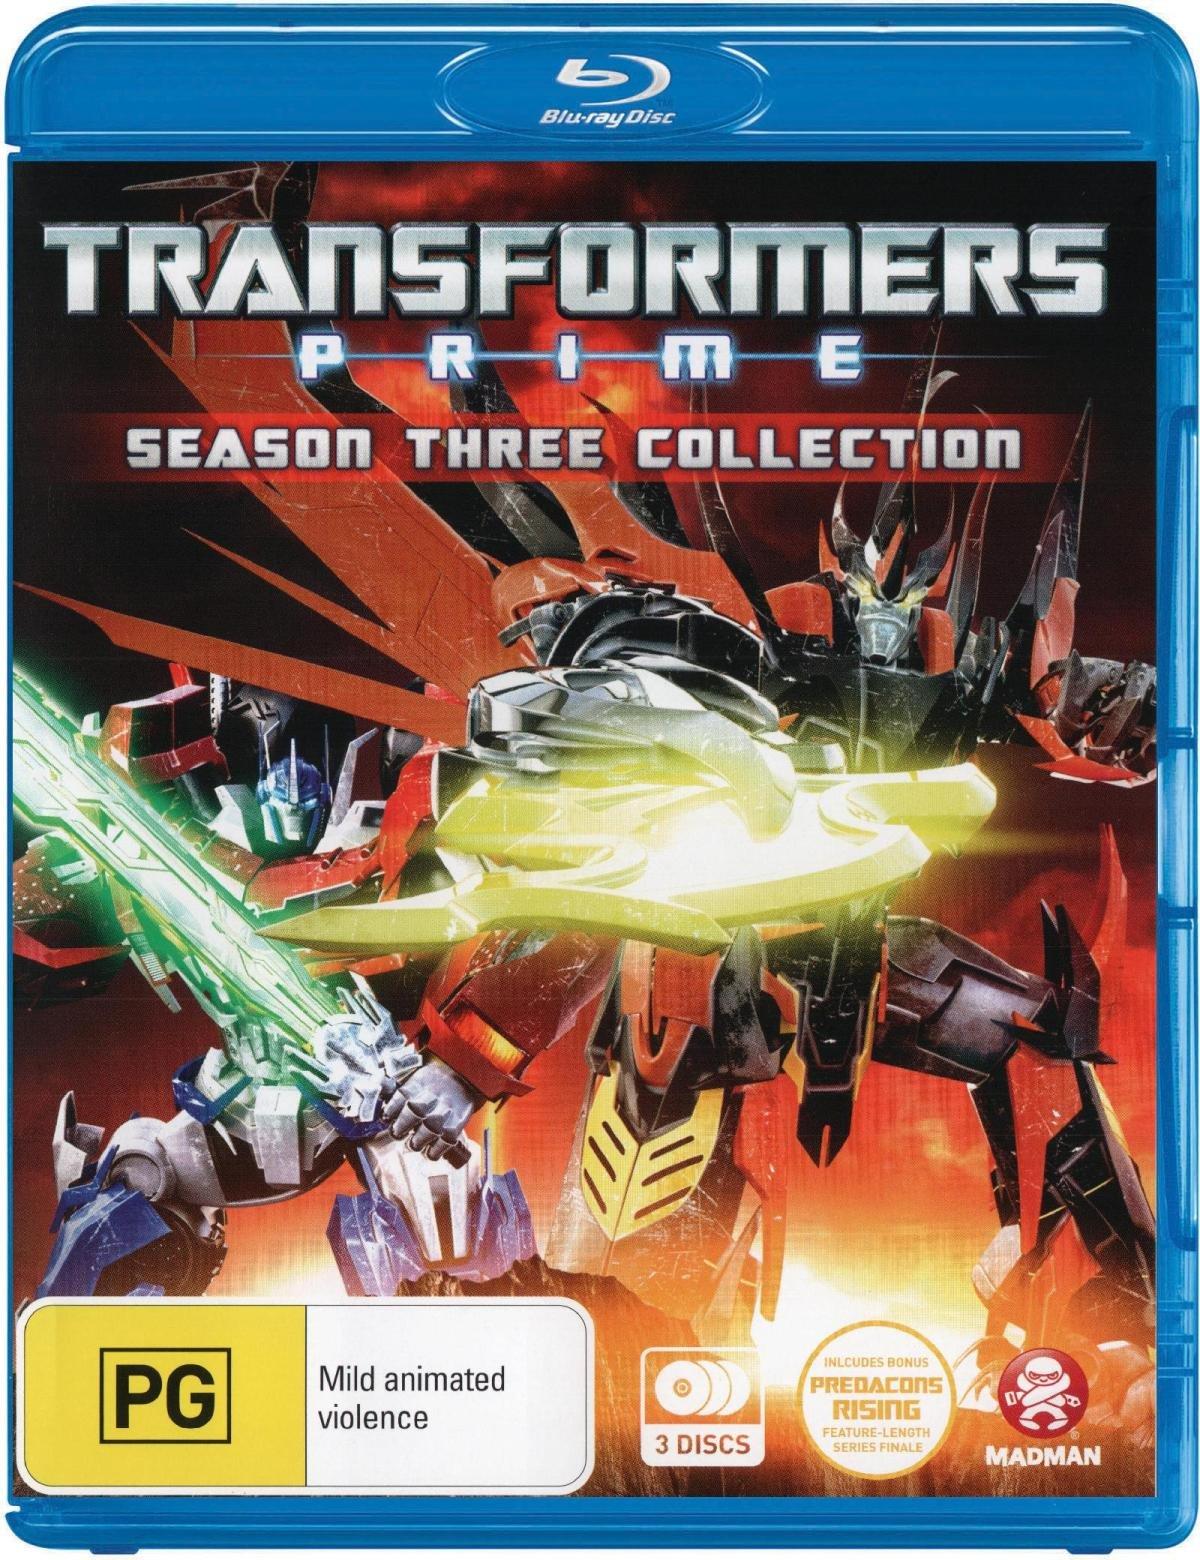 Transformers: Prime Season 3 [Blu-ray]